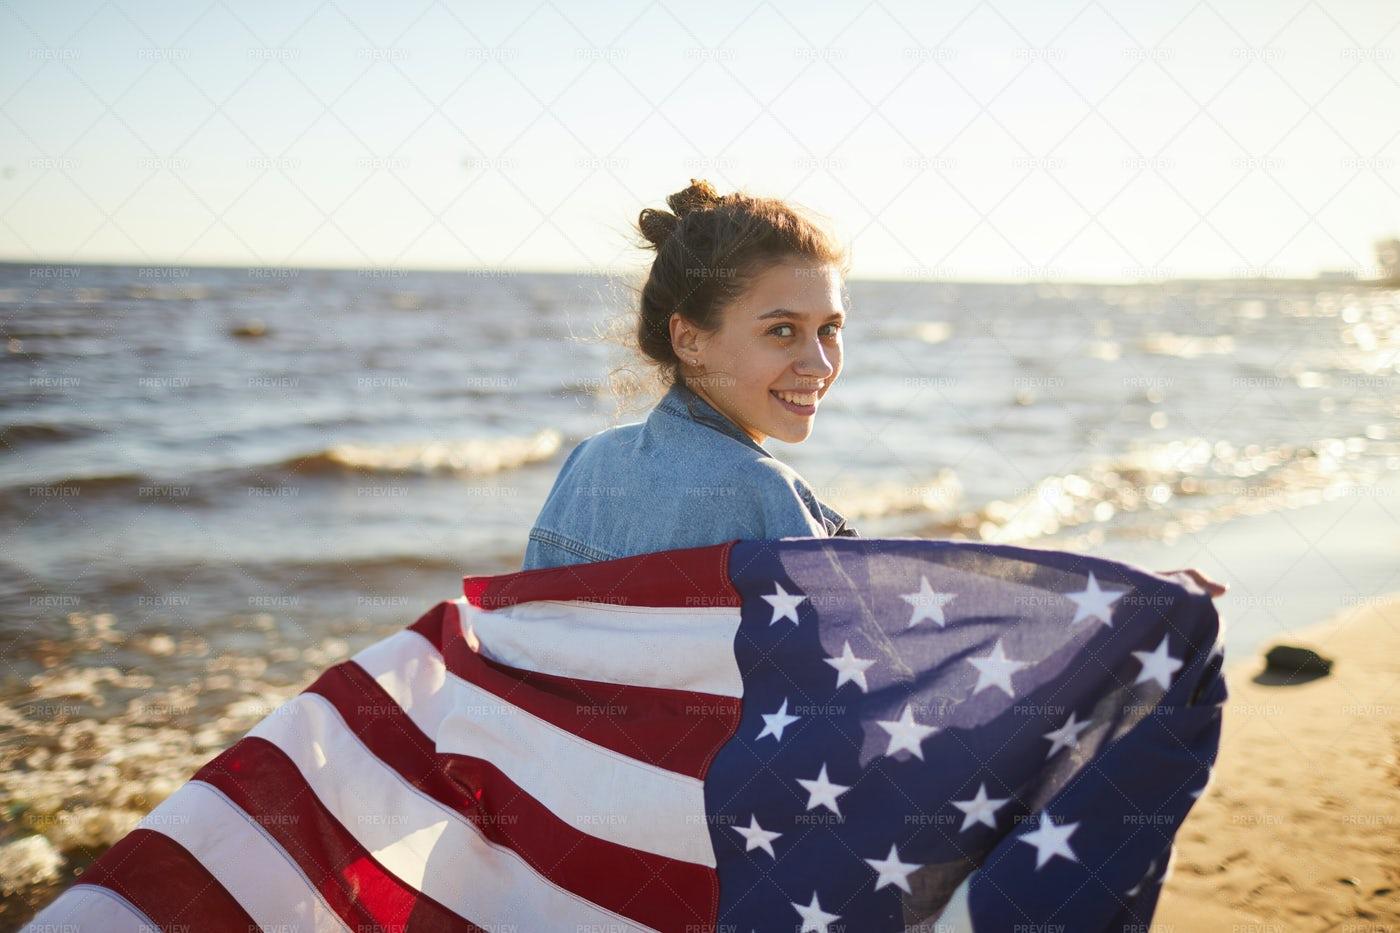 Smiling Woman With Big National...: Stock Photos